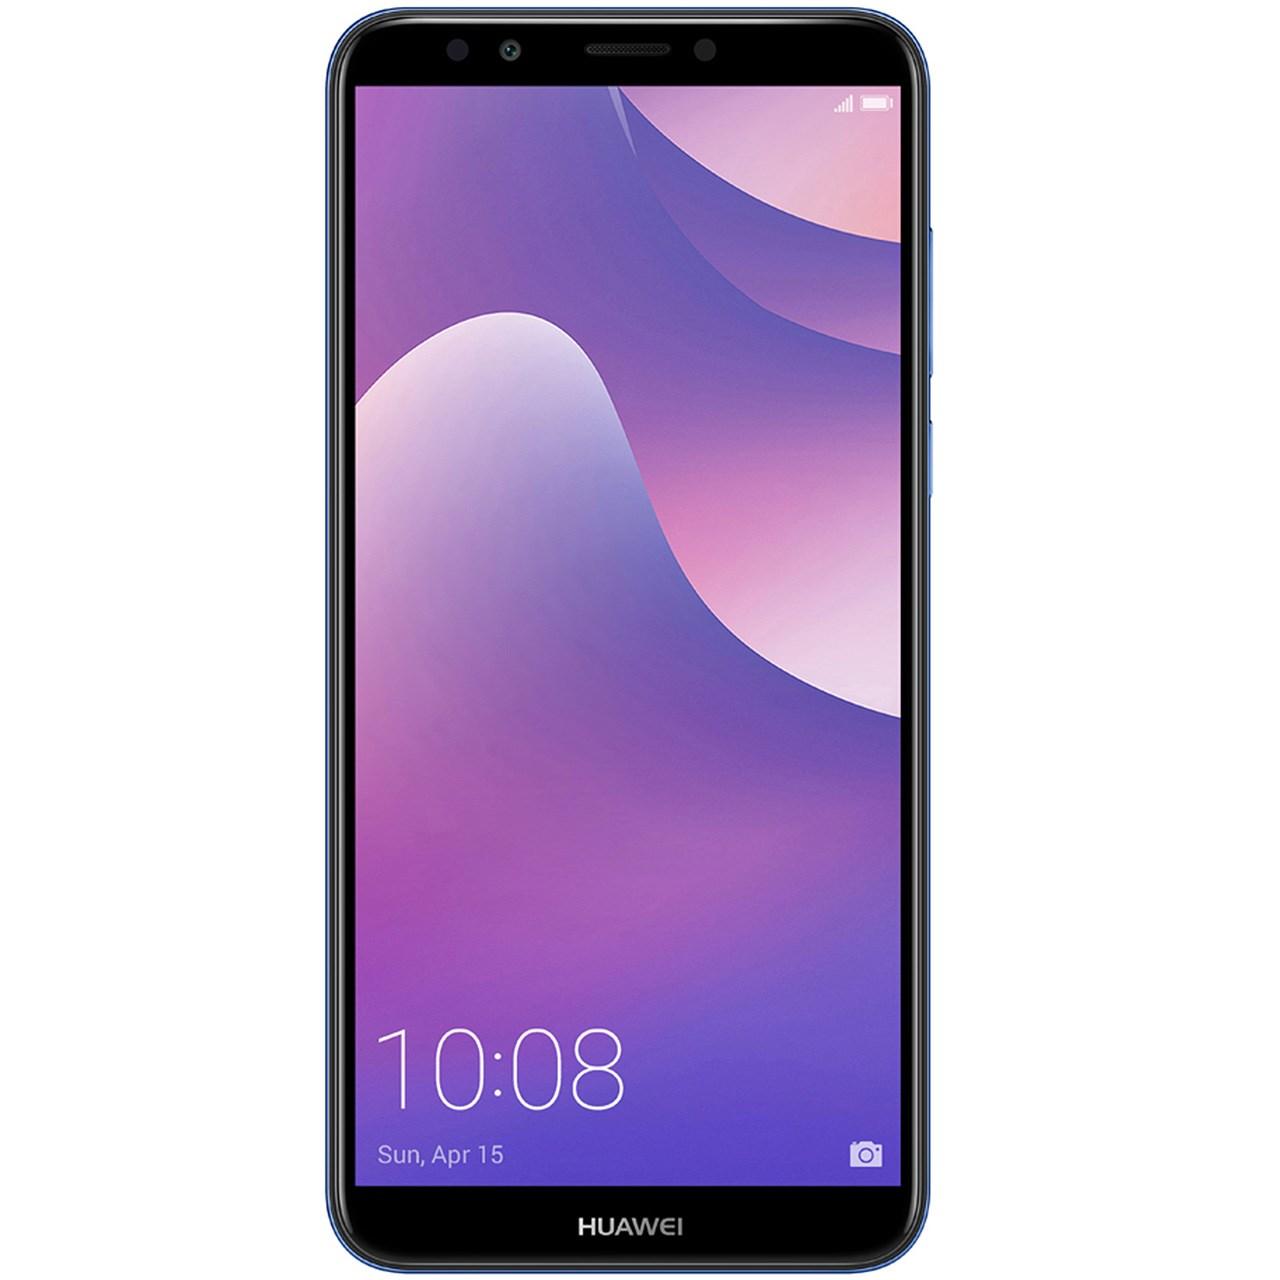 گوشی موبایل هوآوی مدل Y7 Prime 2018 دو سیم کارت                             Huawei Y7 Prime 2018 Dual SIM Mobile Phone